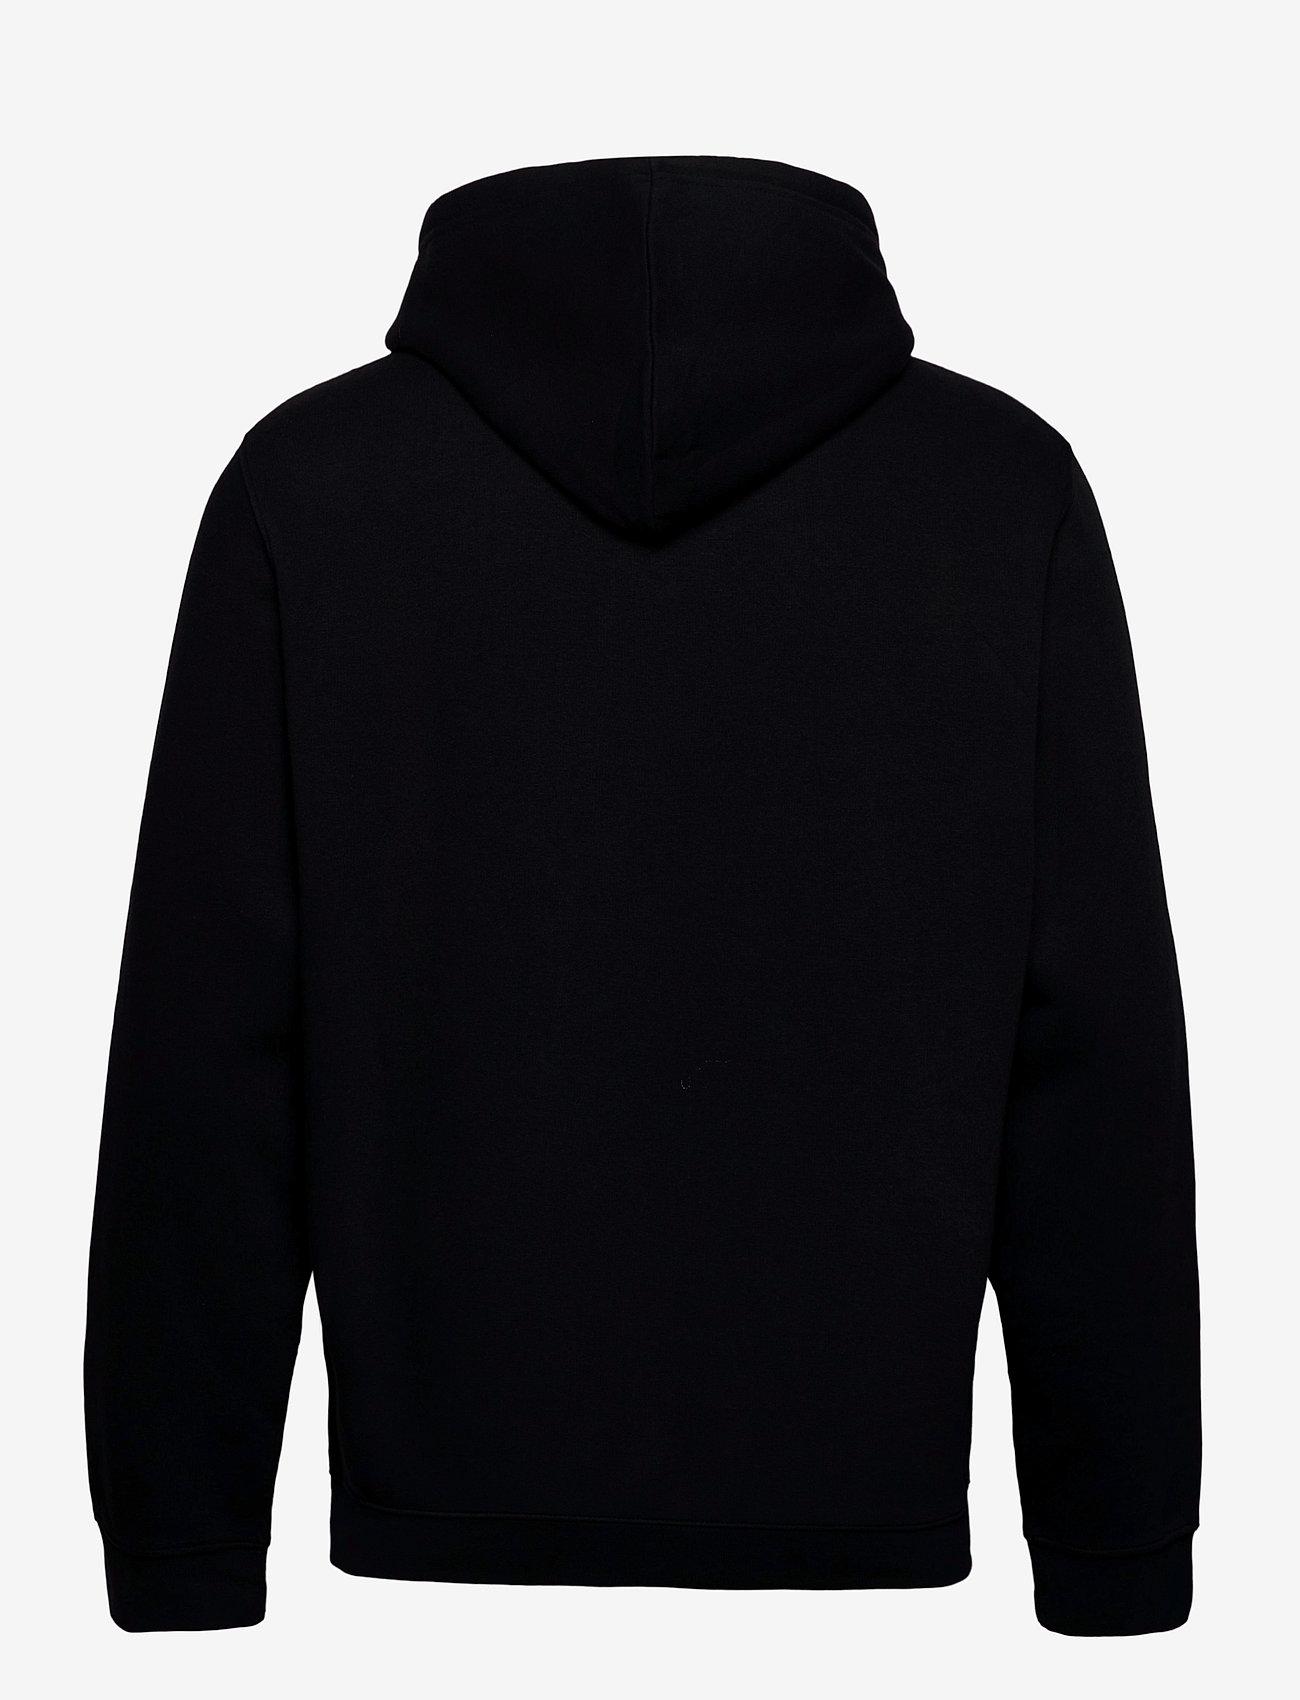 Champion Hooded Sweatshirt - Sweatshirts BLACK BEAUTY - Menn Klær